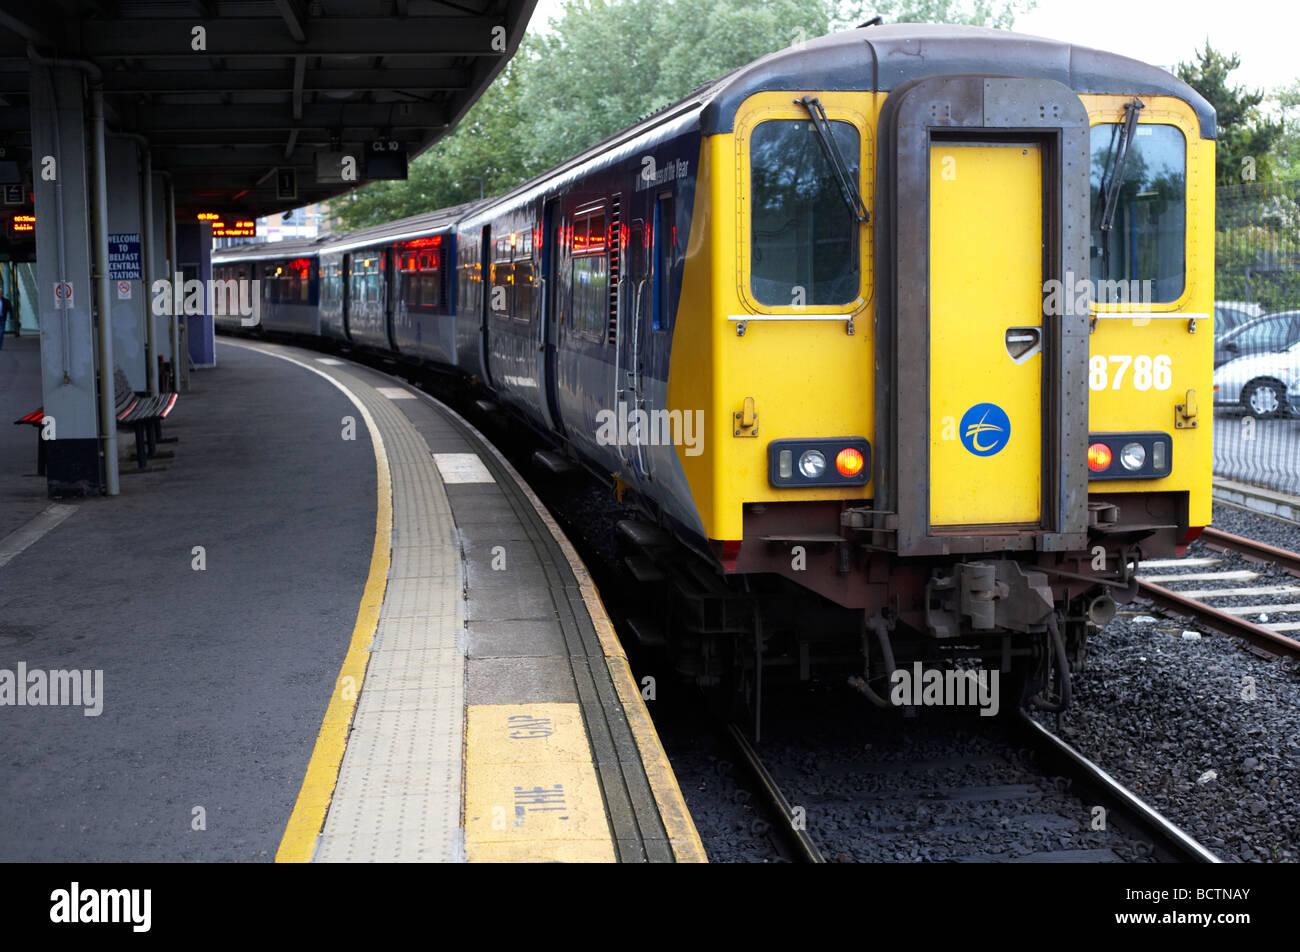 train on platform at belfast central station northern ireland uk Stock Photo